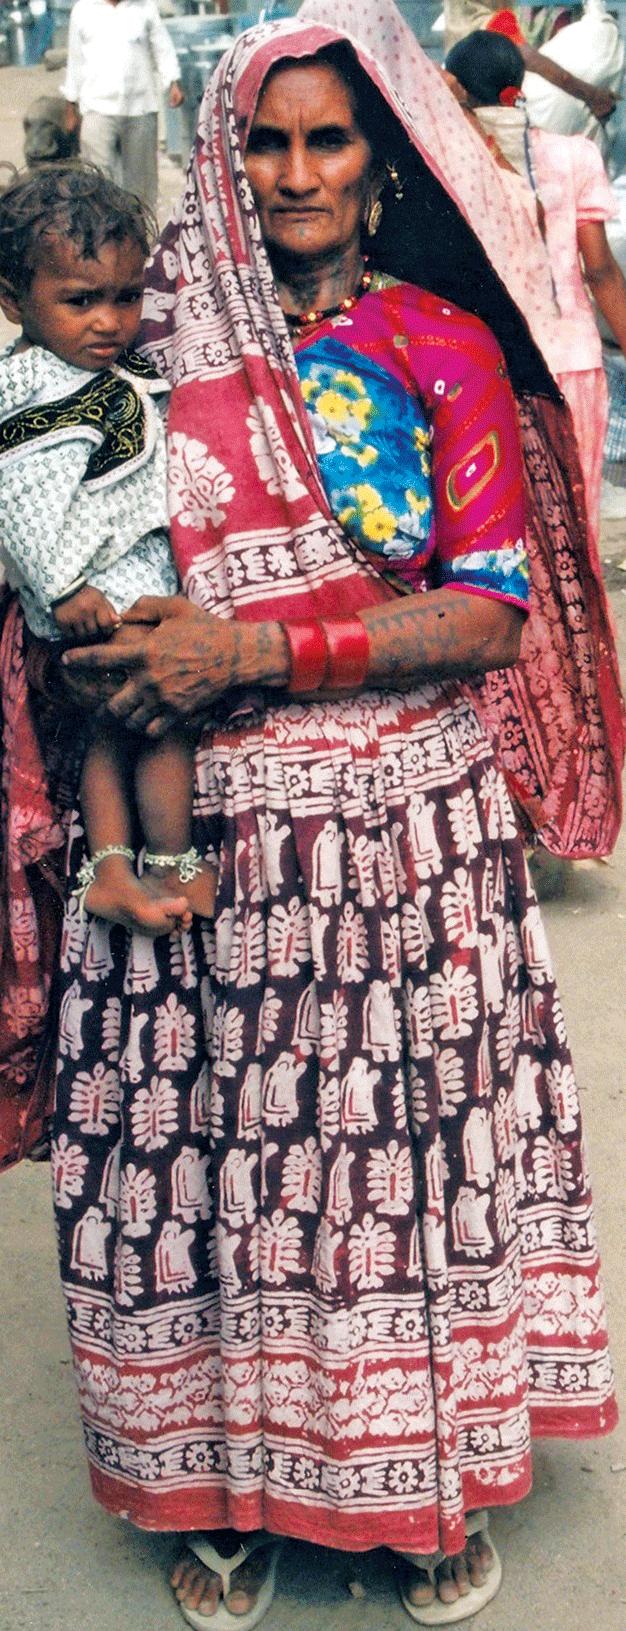 Traditional batik sadla worn by a woman from the Kanbi Patel community